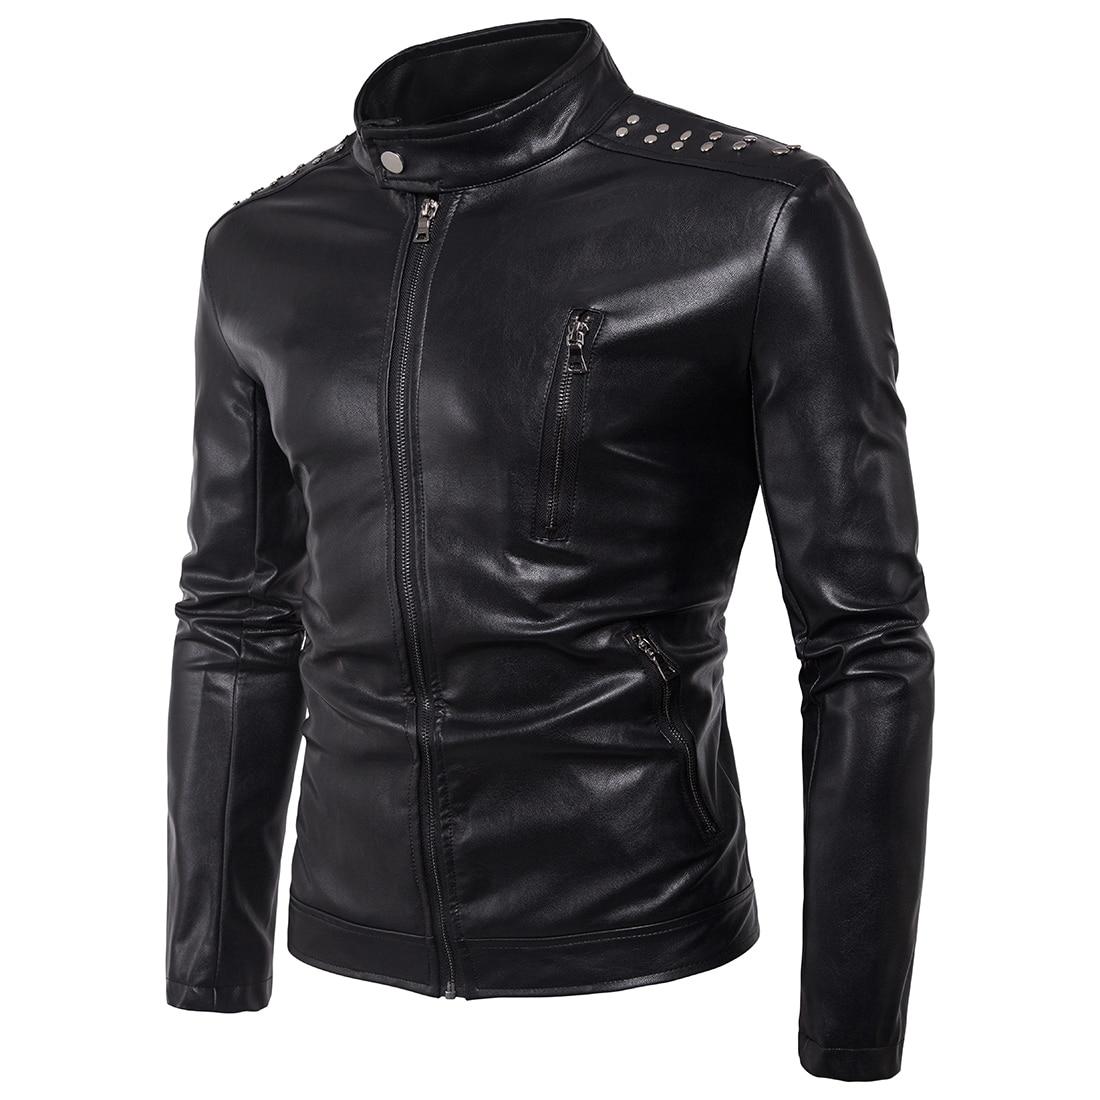 66f2862302 US $46.11 43% OFF|New Men 's Motorcycle Shoulder Rivet Decorative leather  jackets men slim leather jacket brand Casual Coats Overcoats zipper-in Faux  ...